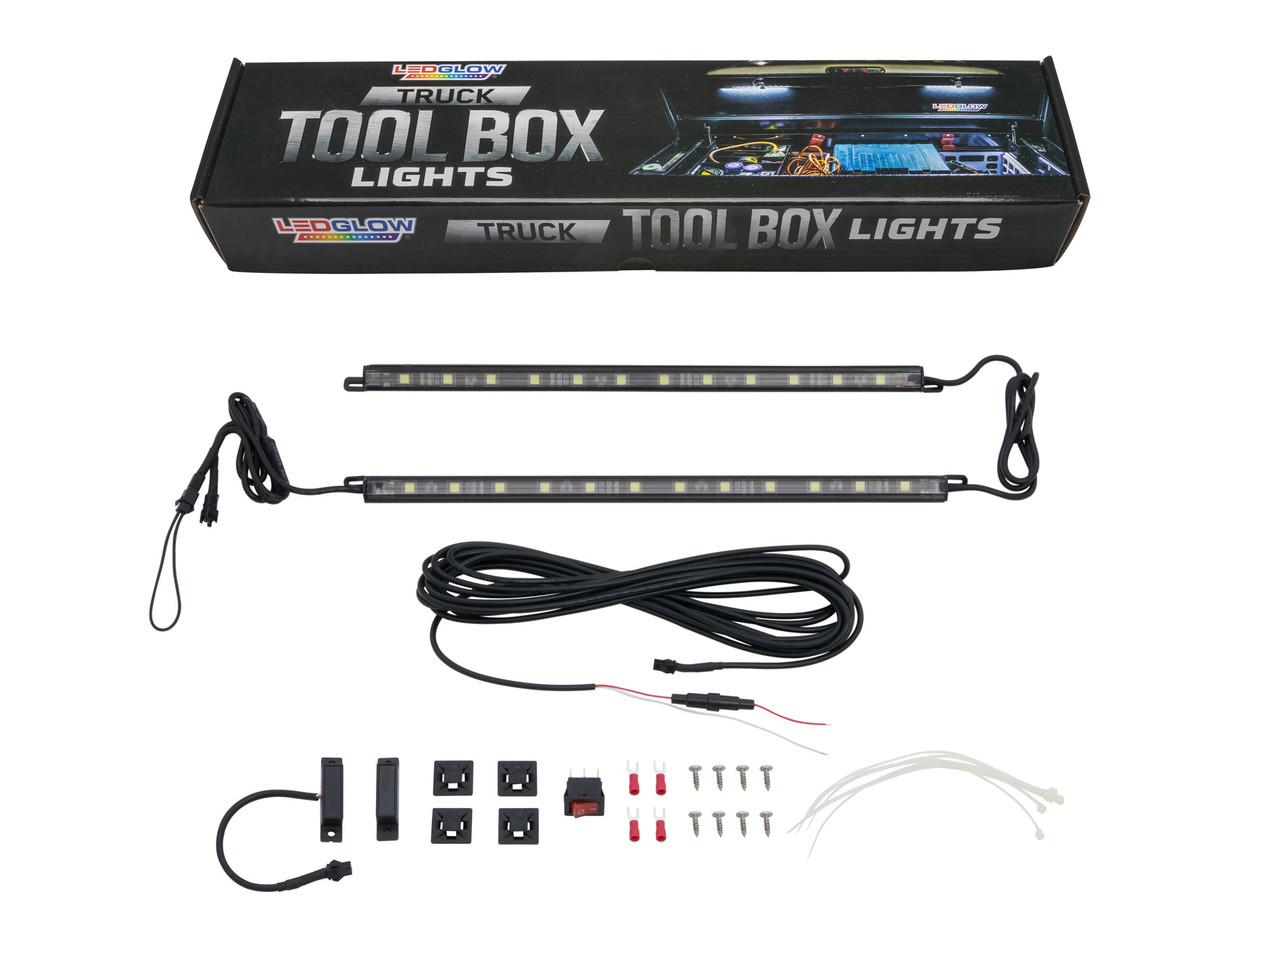 2pc white led truck tool box lighting kit